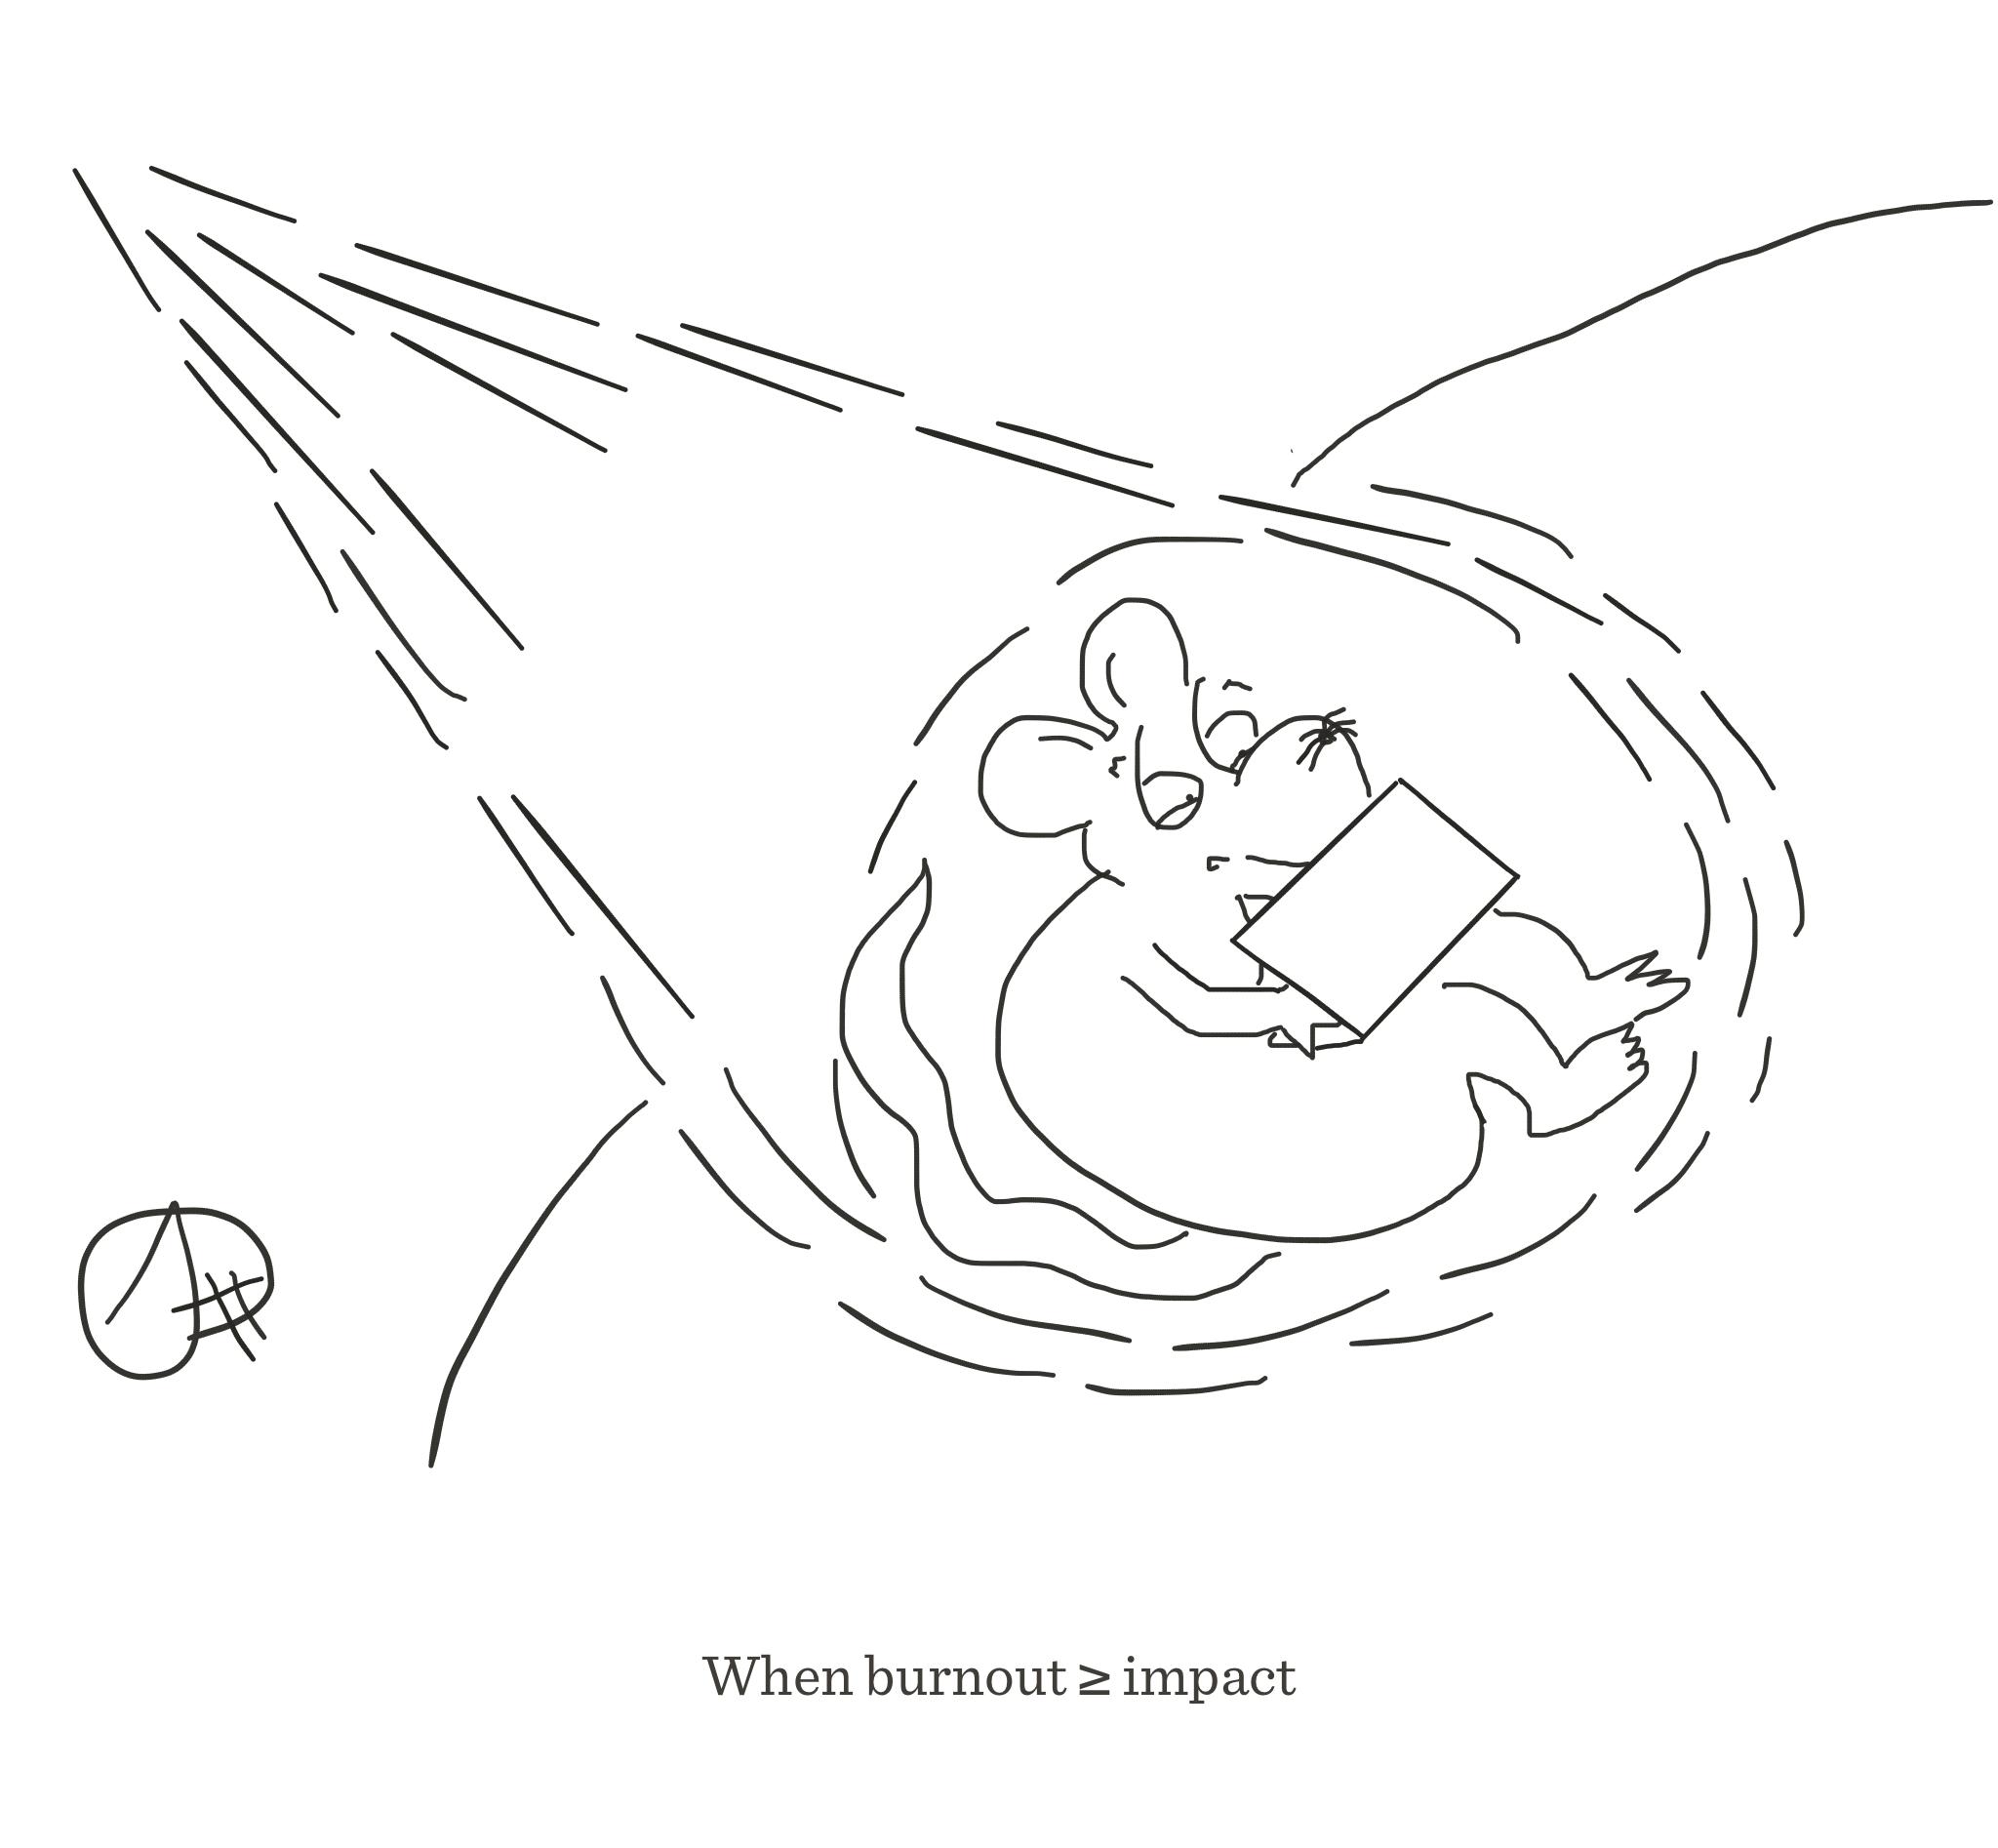 When burnout ≥ impact, The Happy Rat cartoon